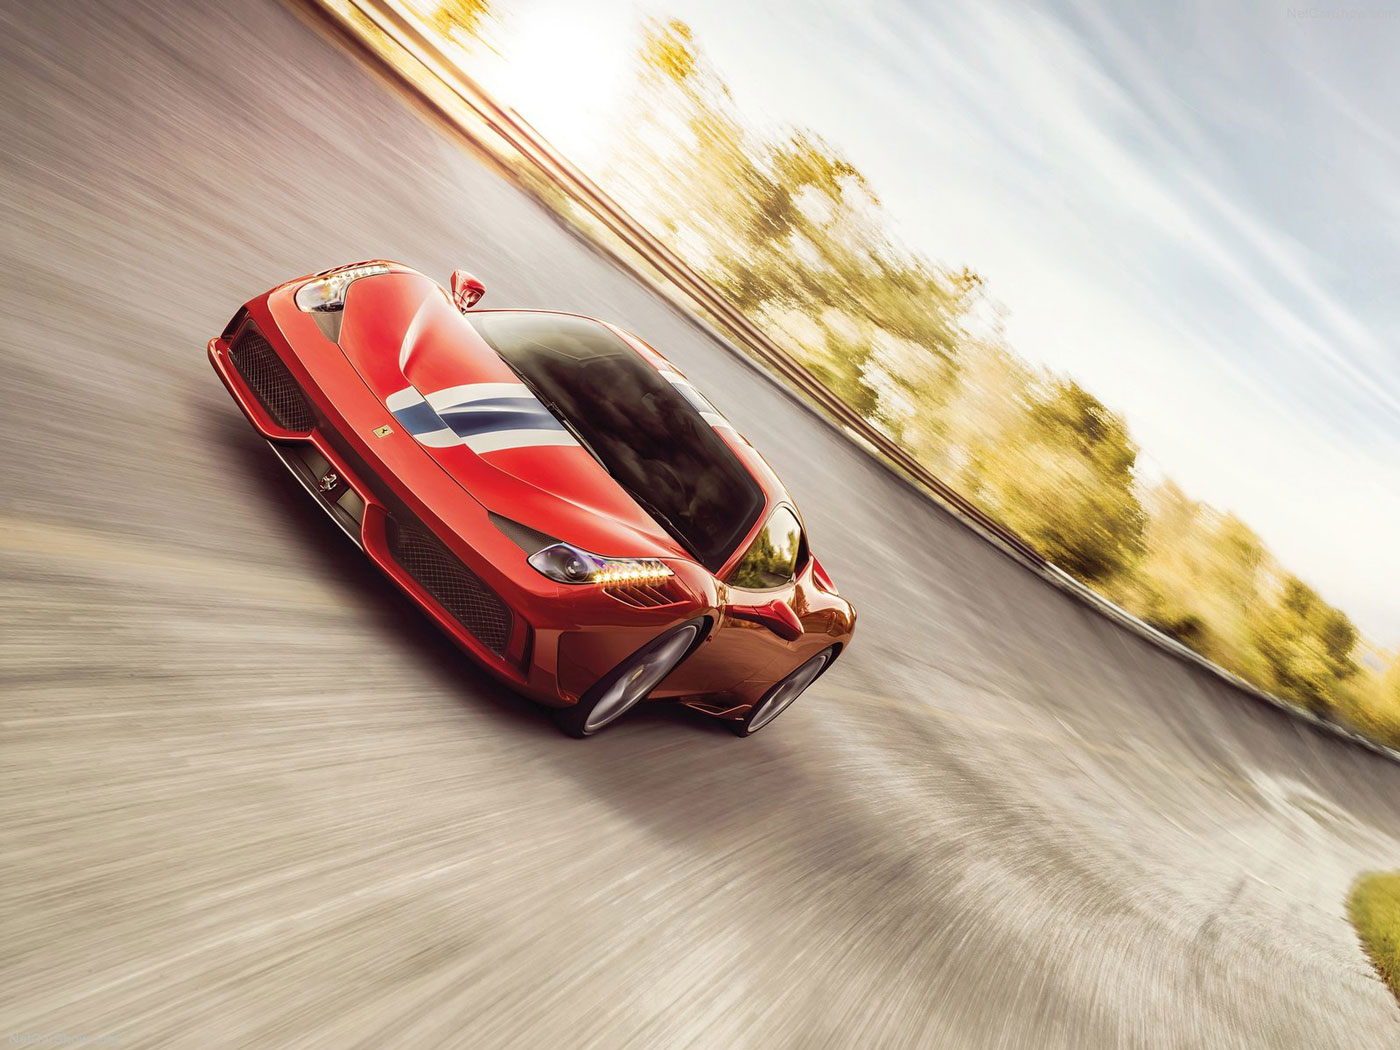 Ferrari-458_Speciale_2014_1600x1200_wallpaper_04